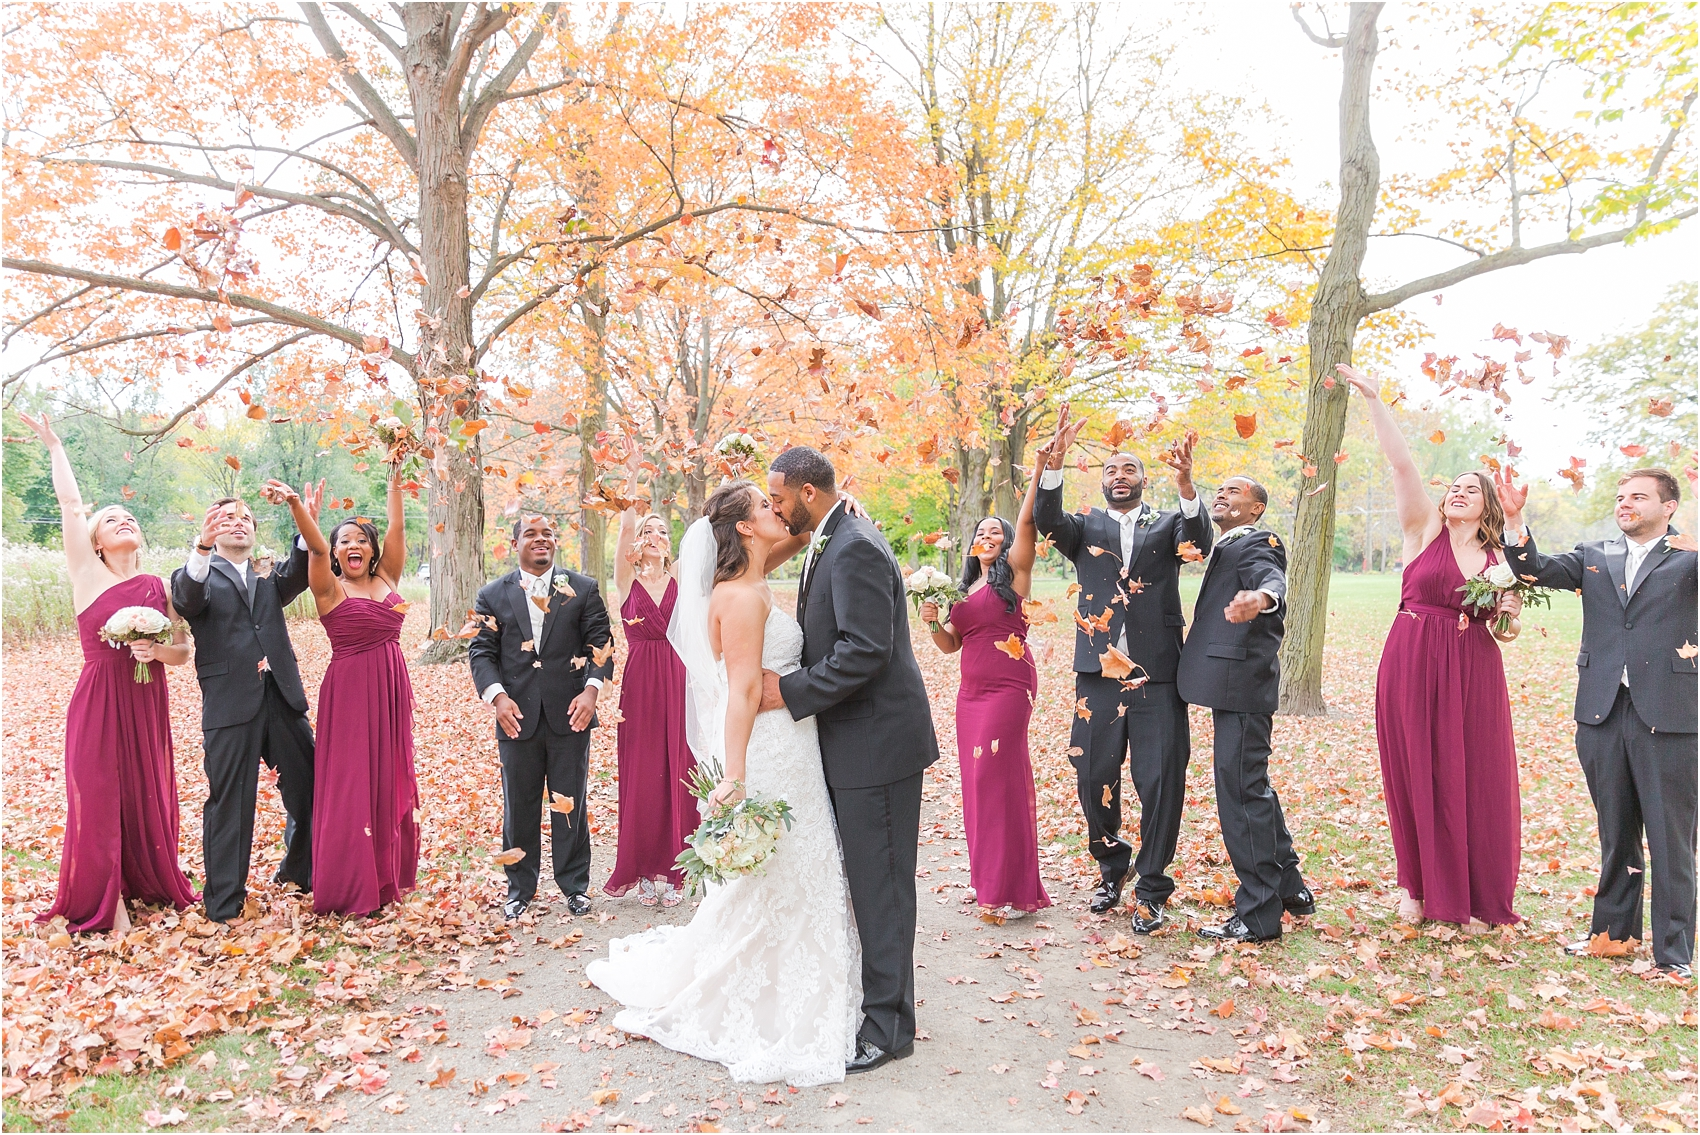 elegant-and-romantic-fall-wedding-photos-at-st-marys-catholic-church-in-monroe-michigan-by-courtney-carolyn-photography_0045.jpg